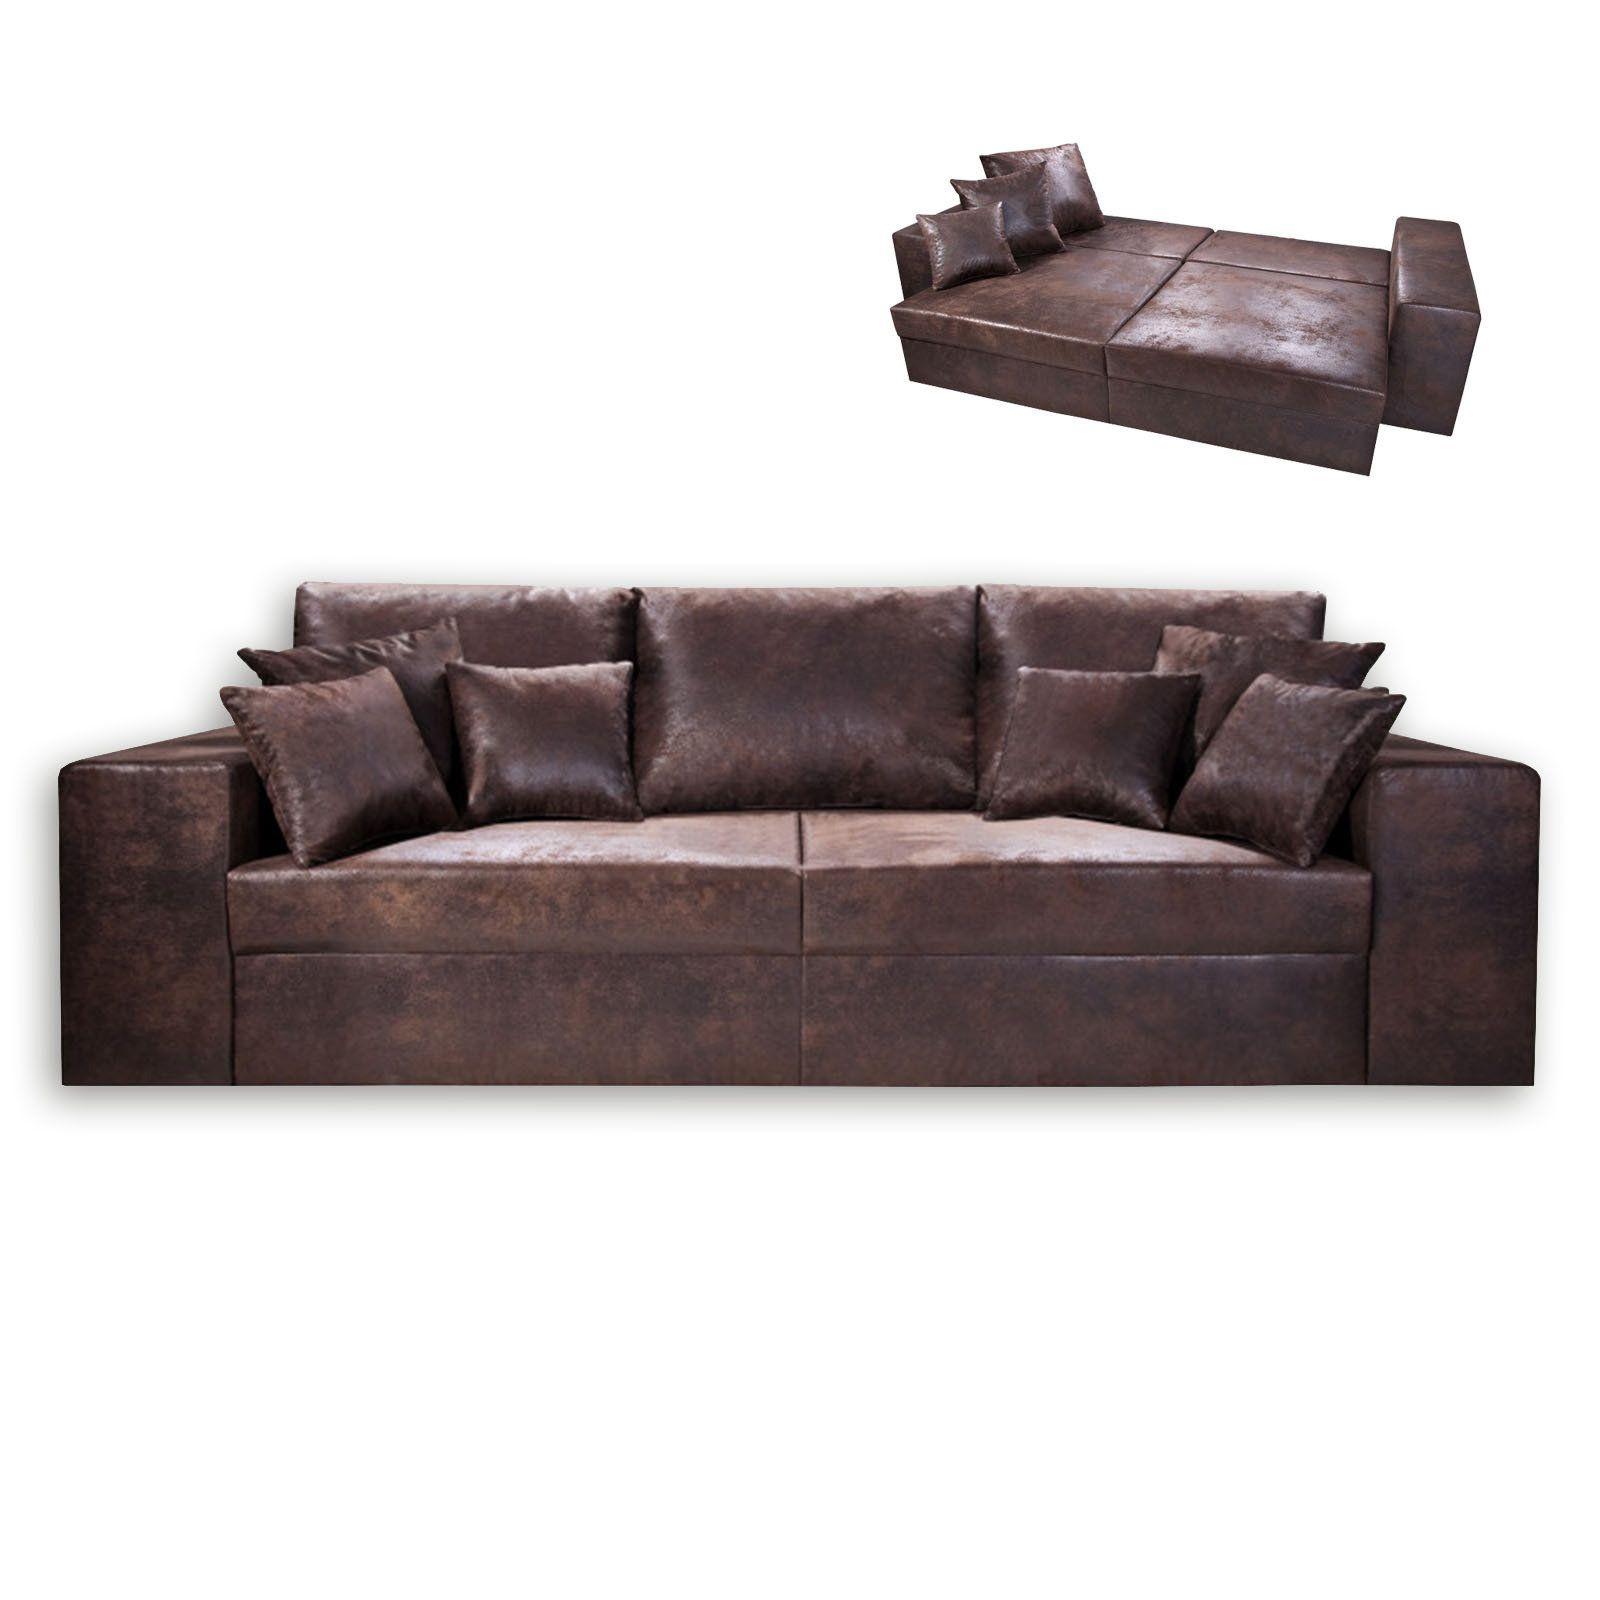 Bemerkenswert Big Sofa Microfaser Dekoration Von Https://www.roller.de/m C3 B6bel/